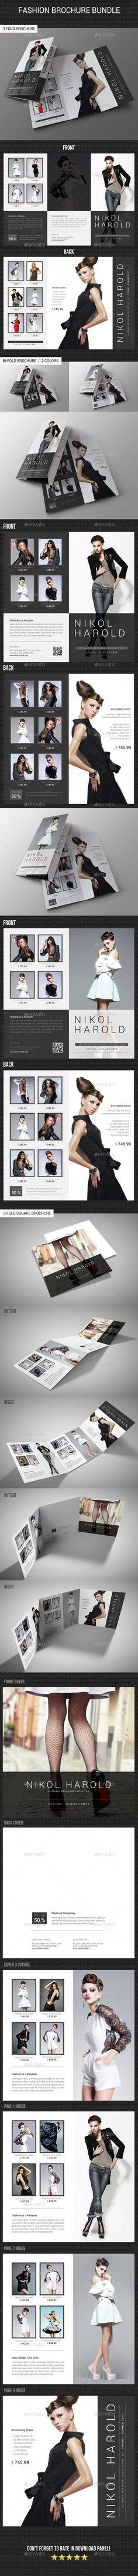 3 Fashion Brochure Bundle - Catalogs #Brochures Download here: https://graphicriver.net/item/3-fashion-brochure-bundle/19549645?ref=alena994